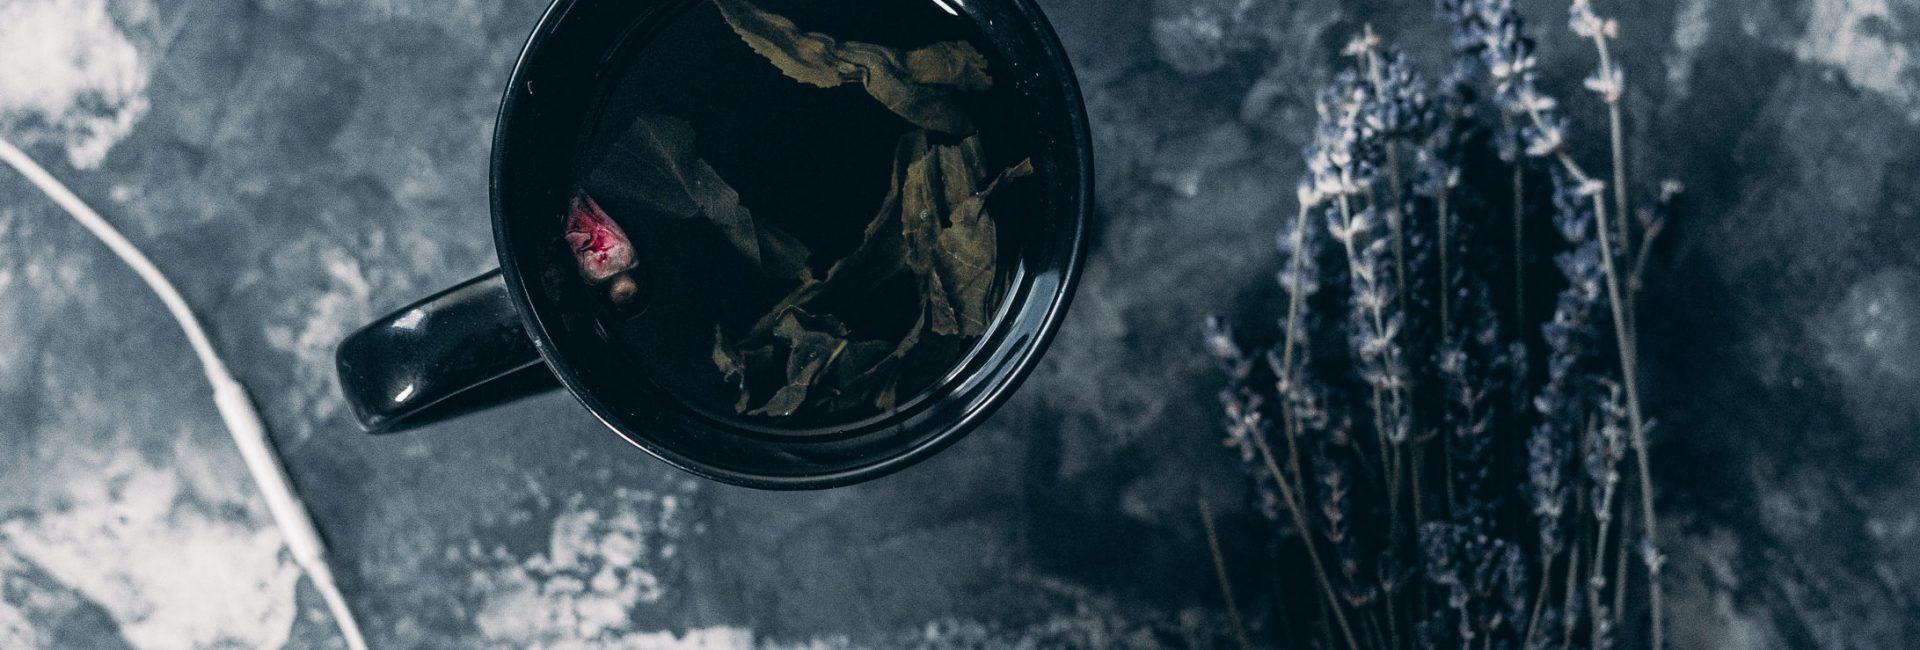 tea-in-black-ceramic-mug-near-apple-earpods-baja